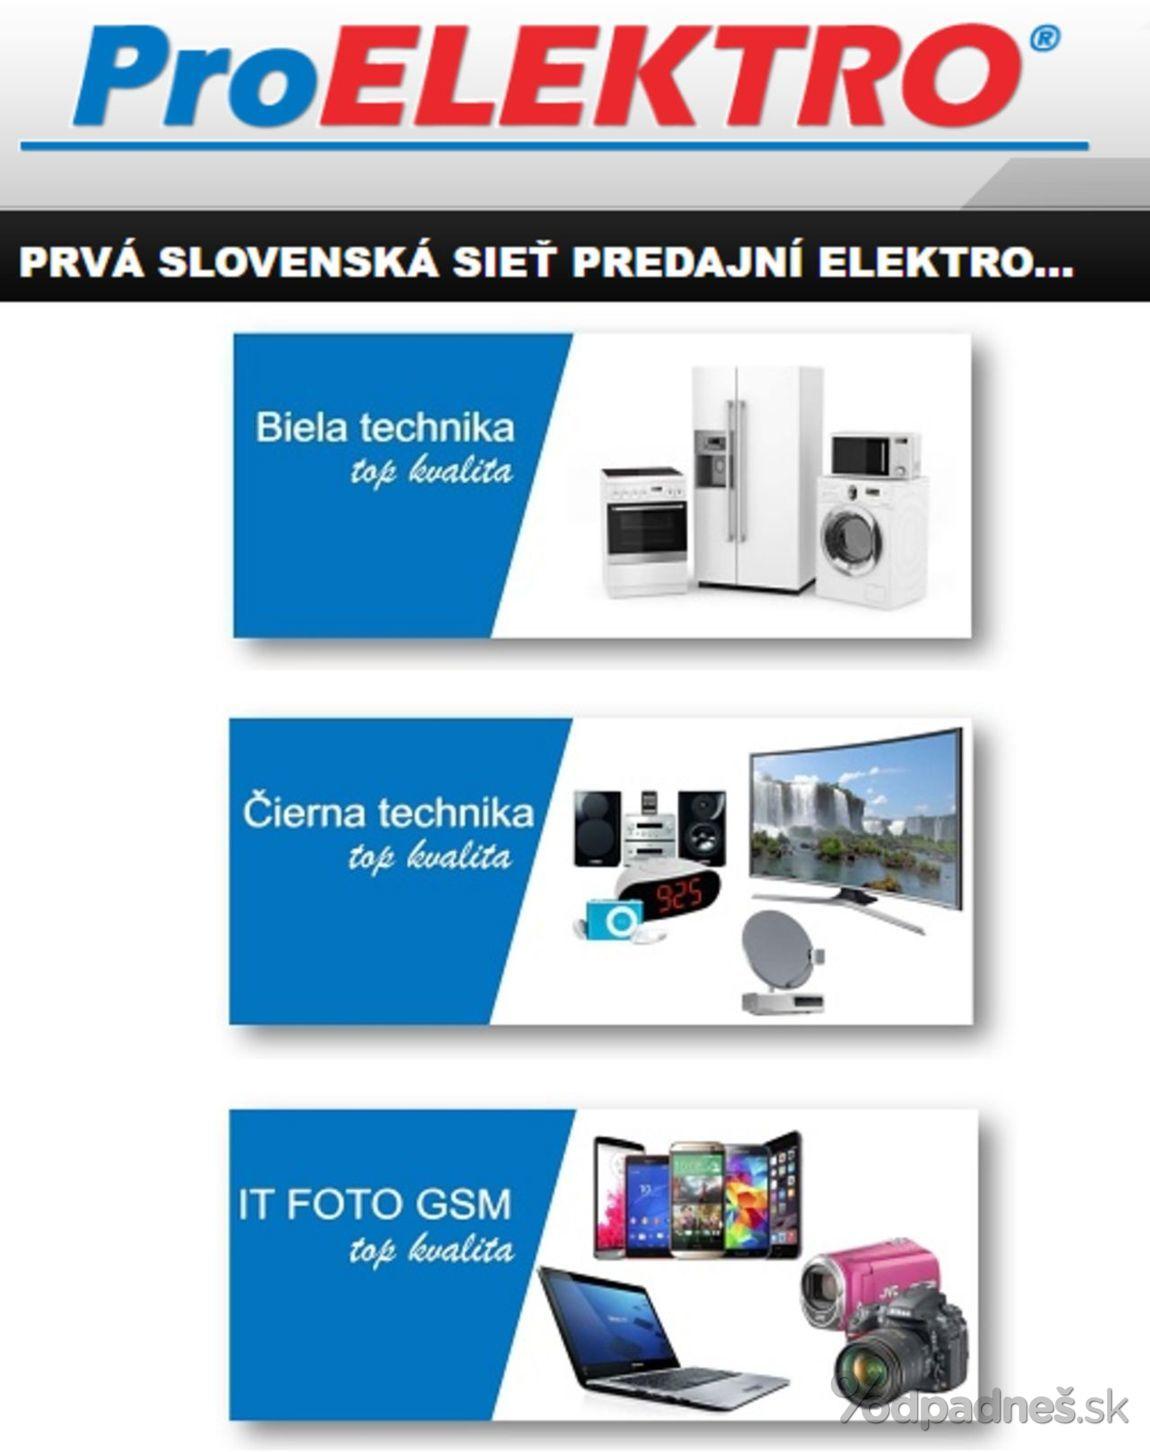 1. stránka Pro Elektro letáku